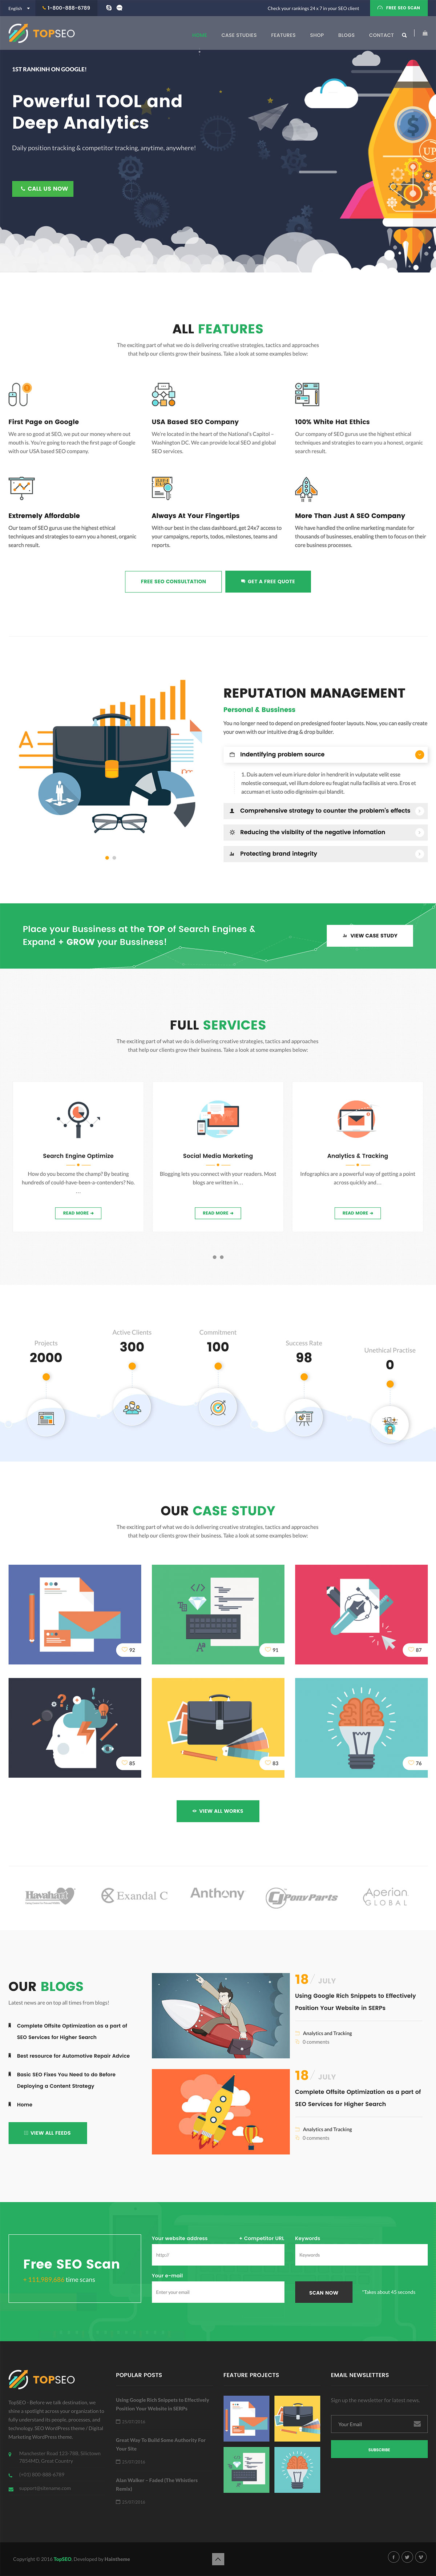 TopSEO - Digital Marketing, SEO WordPress Theme